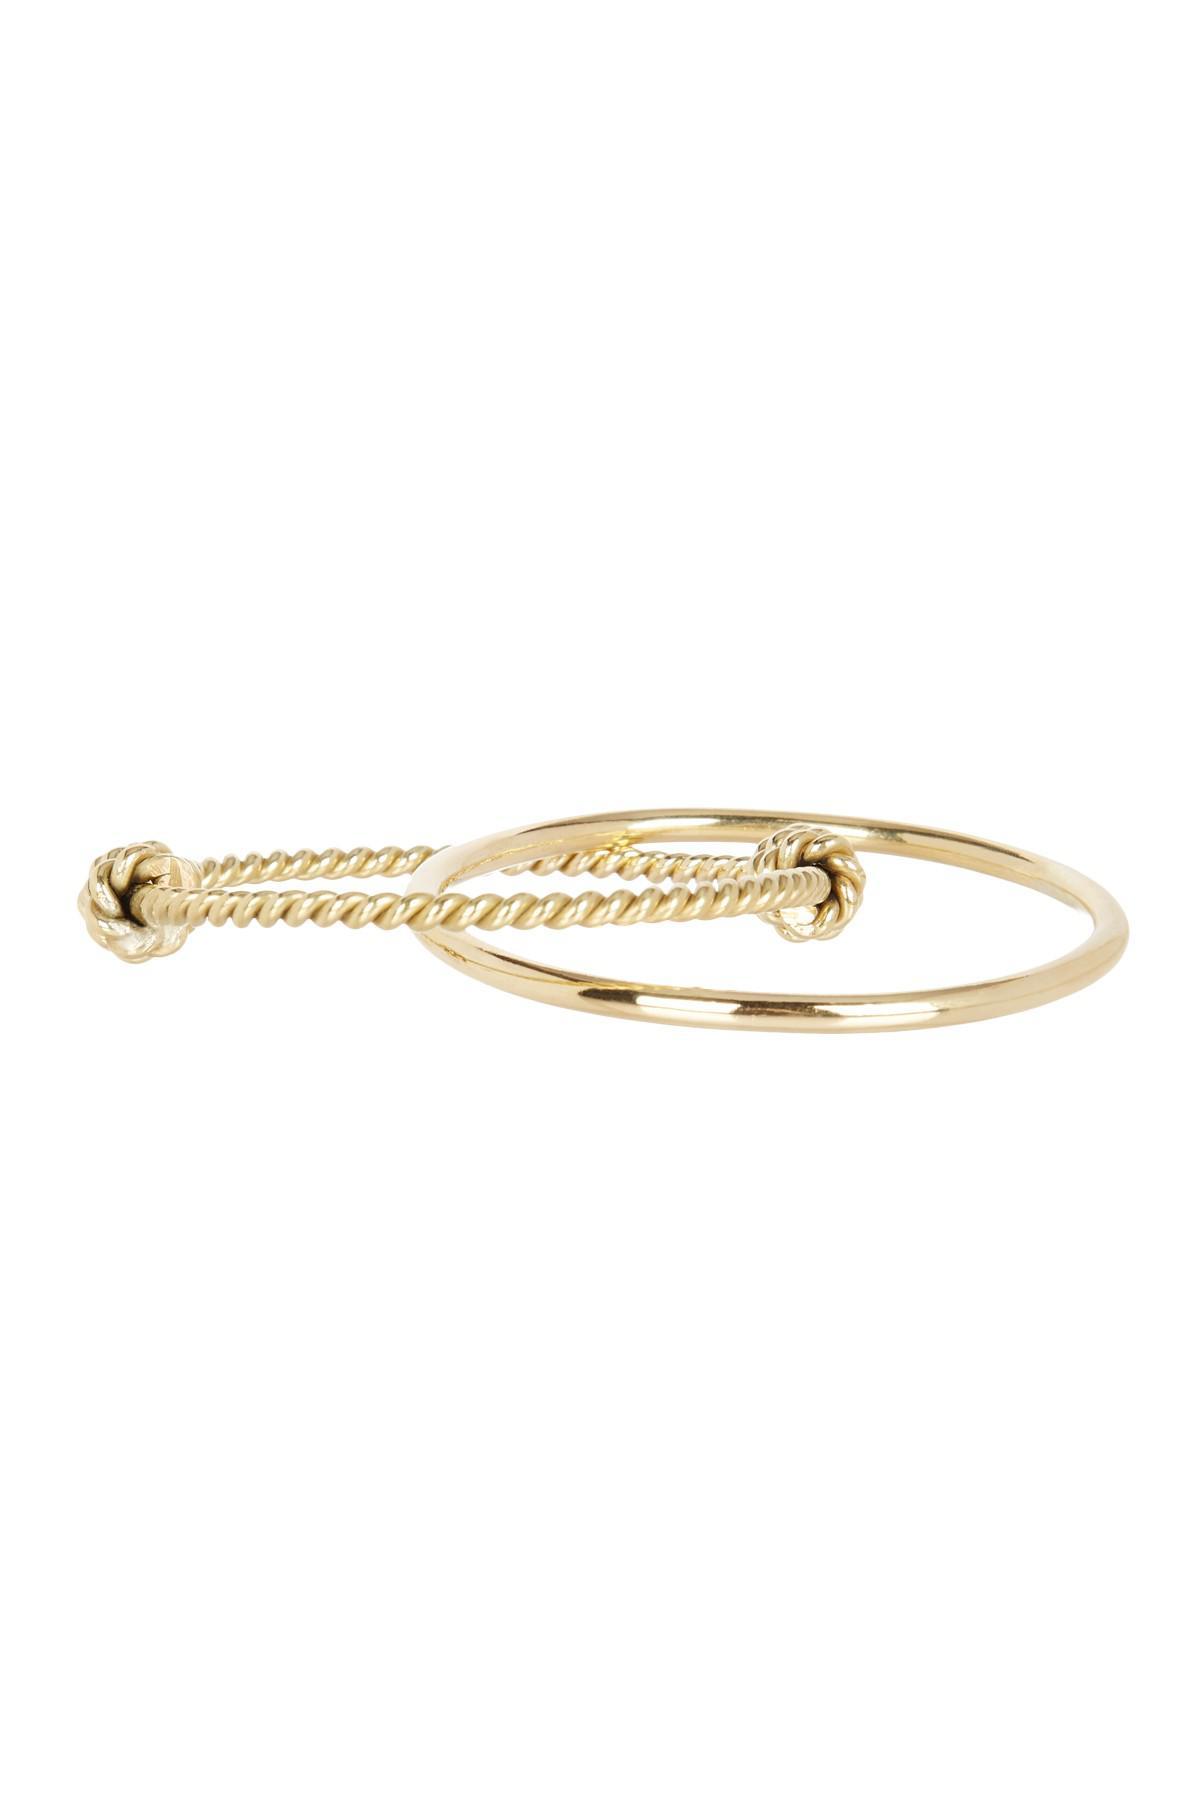 A.V. Max Tricolor Golden Twist Cuff Bracelets, Set of 3